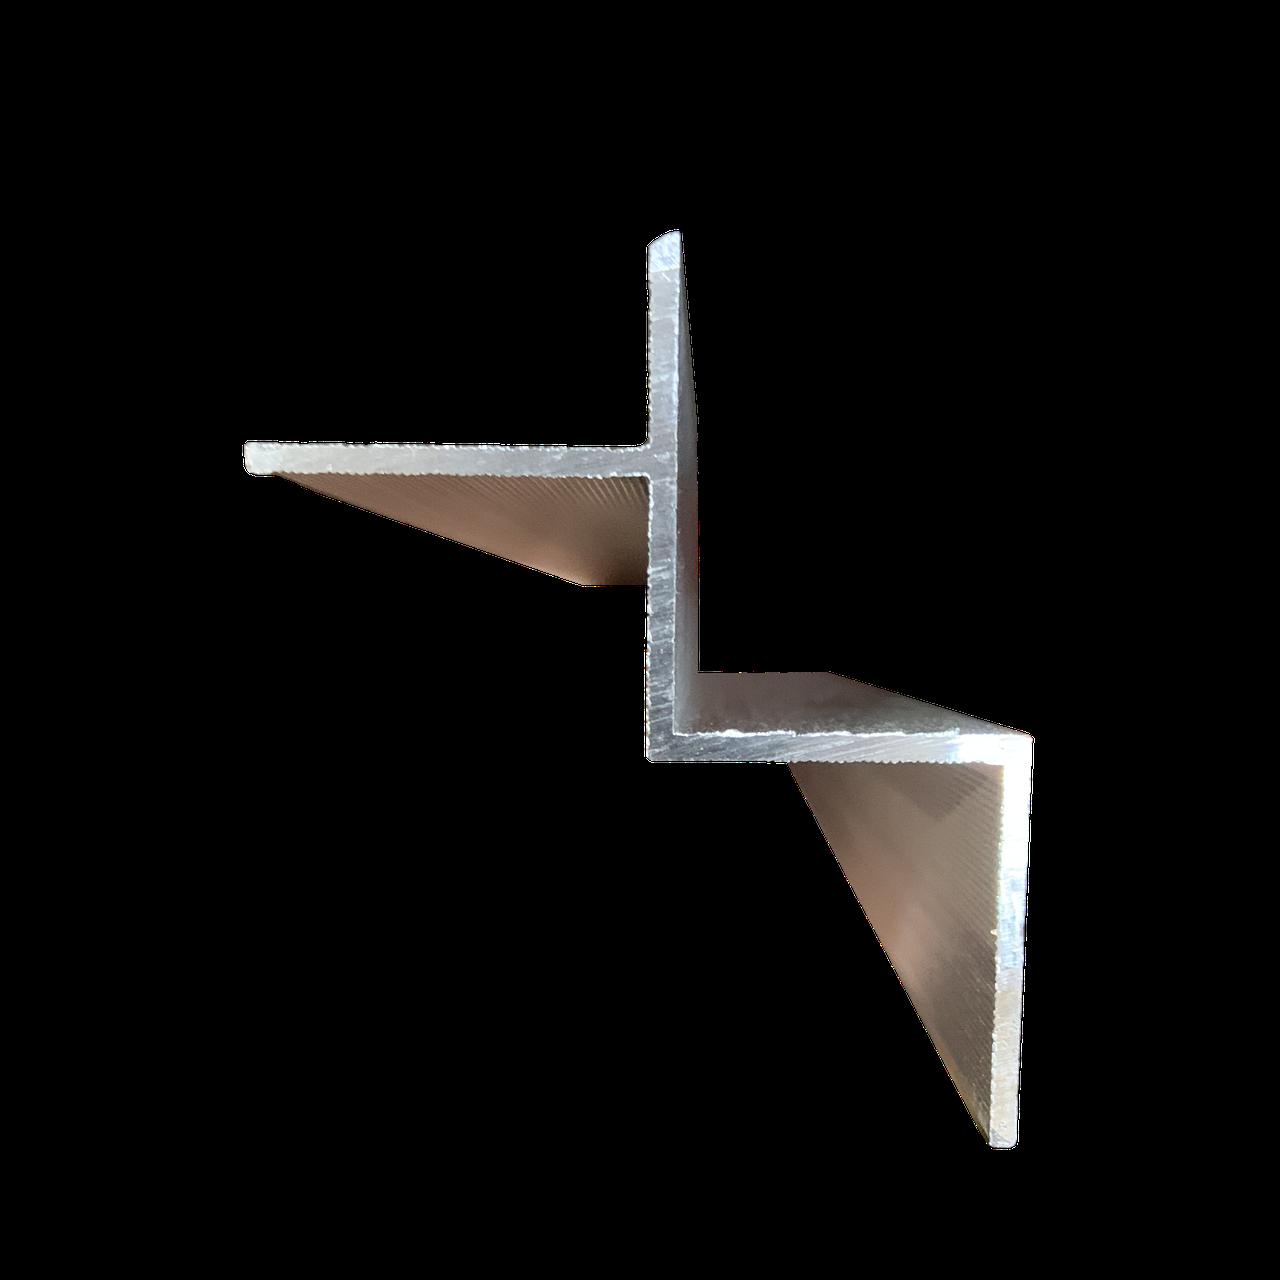 Алюминиевый профиль теневого шва 3м, м.пог.